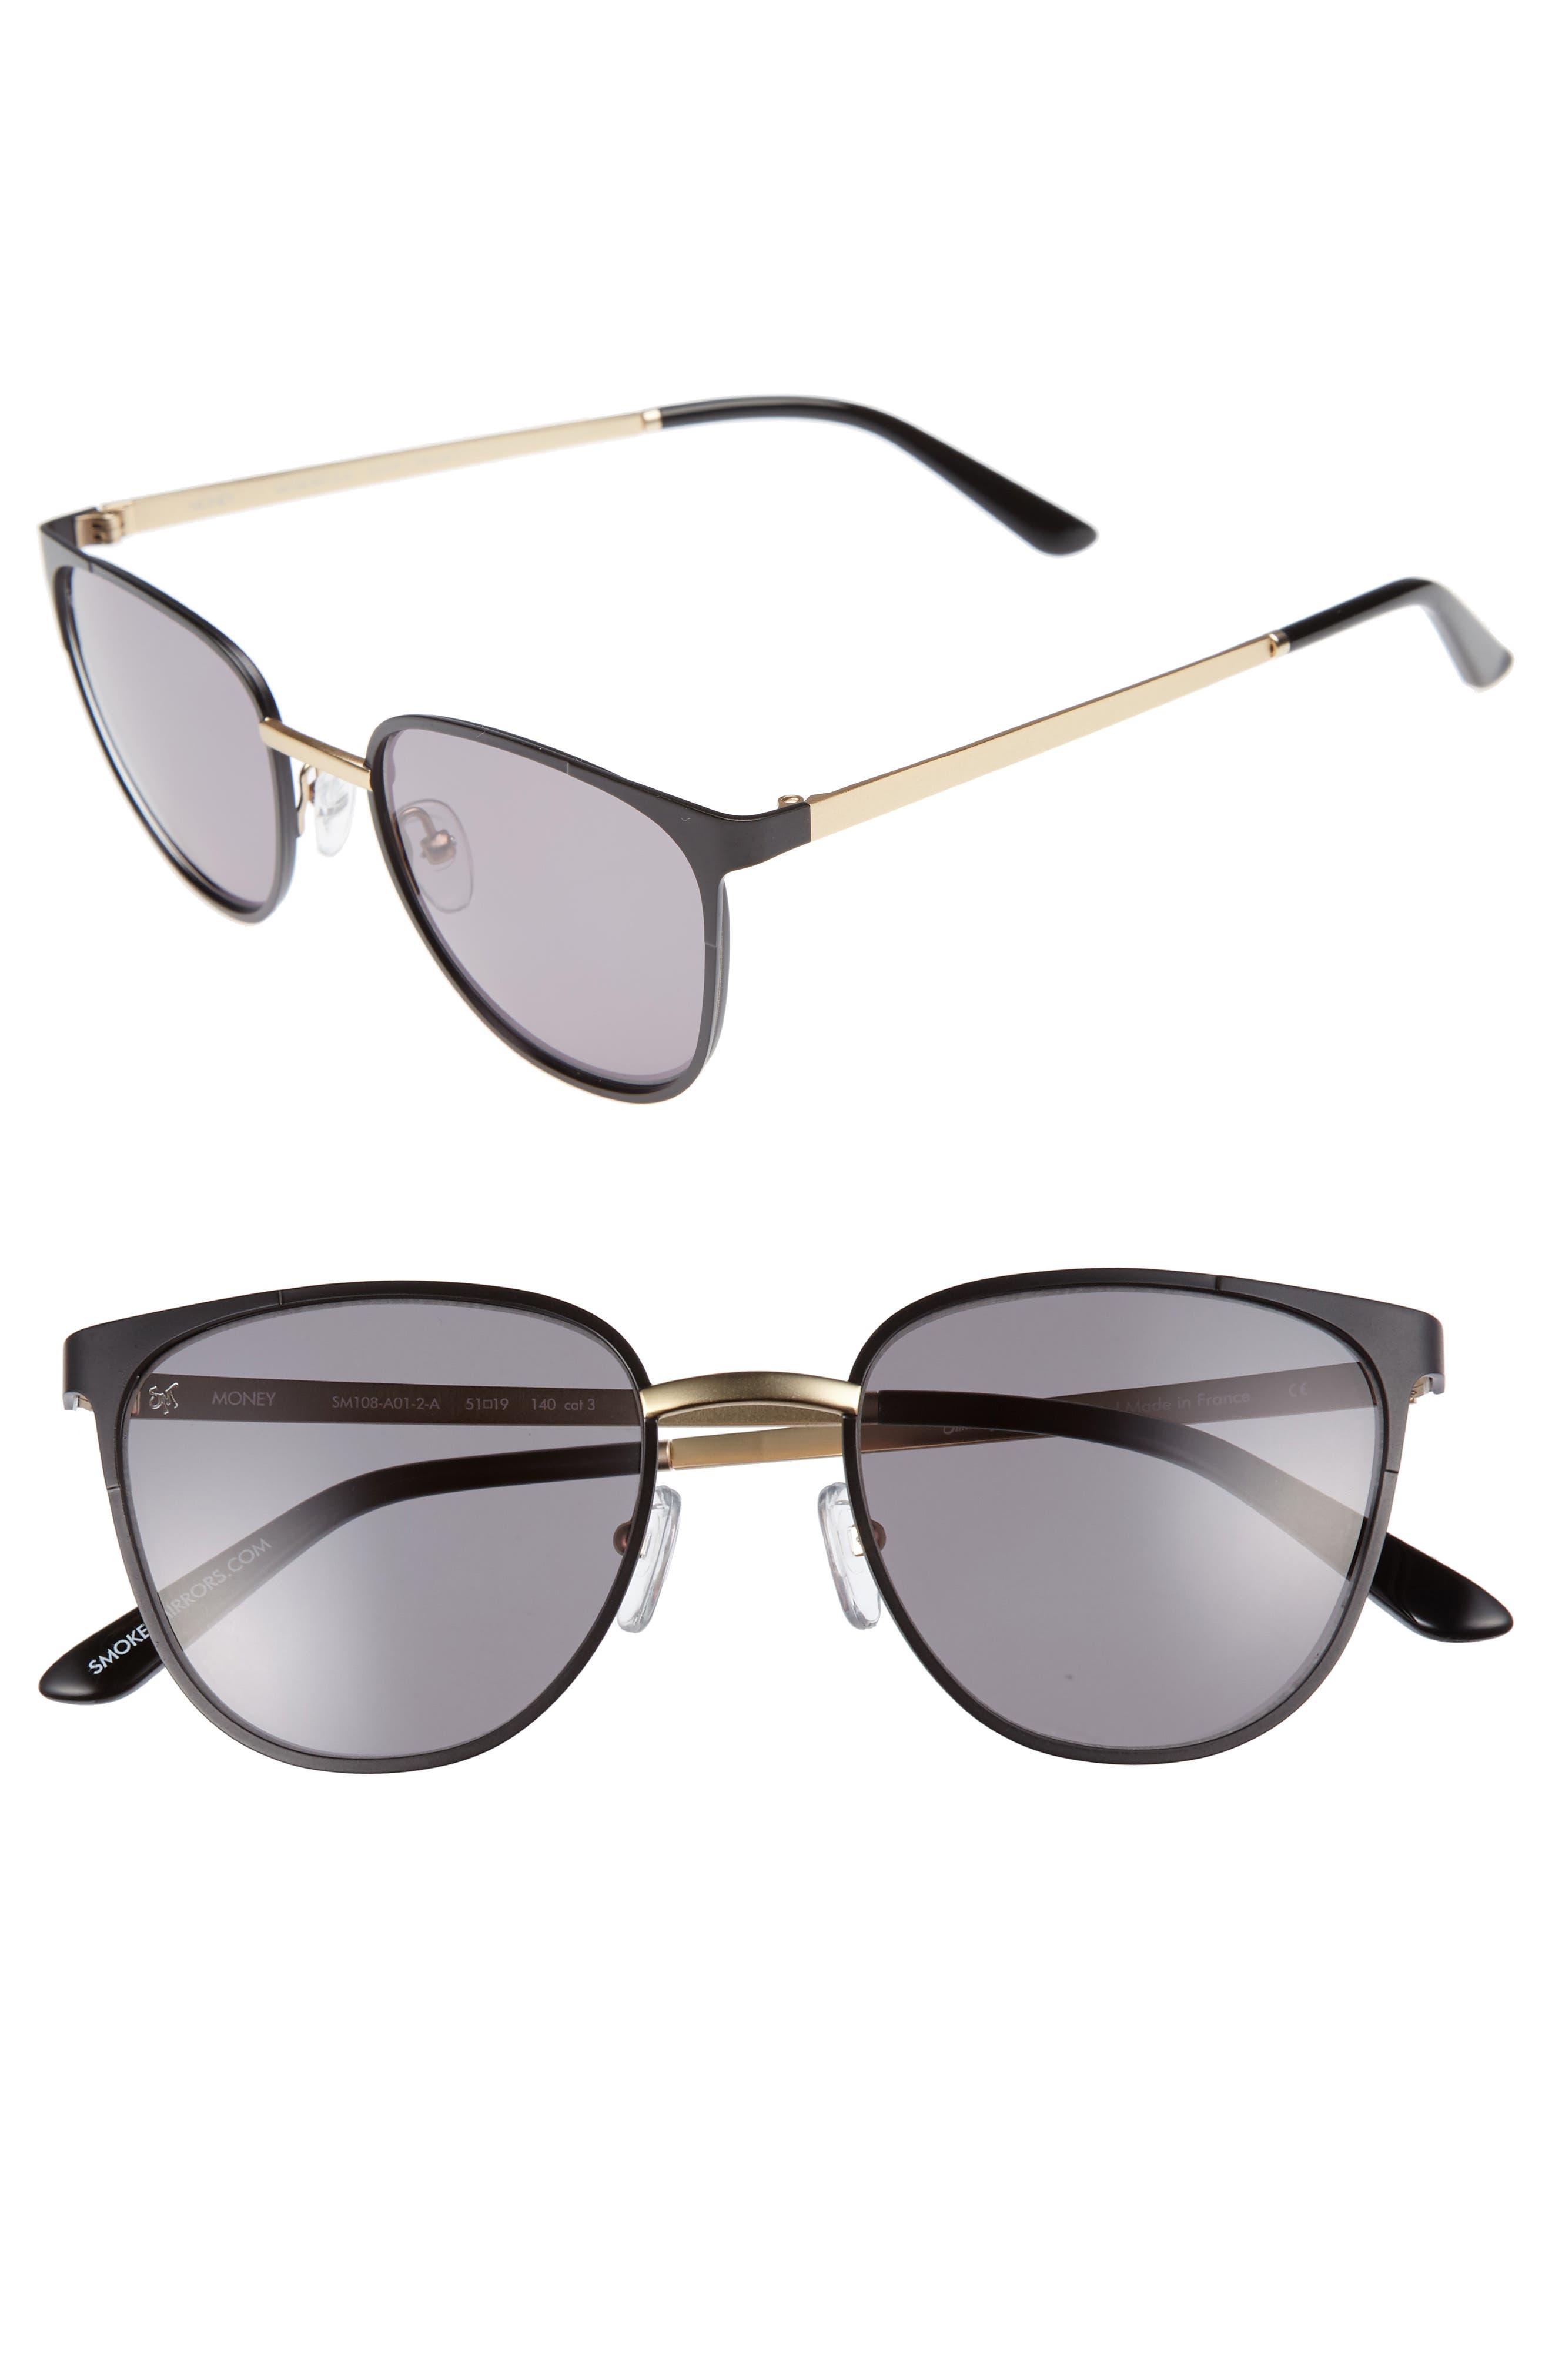 Money 51mm Sunglasses,                         Main,                         color, 001